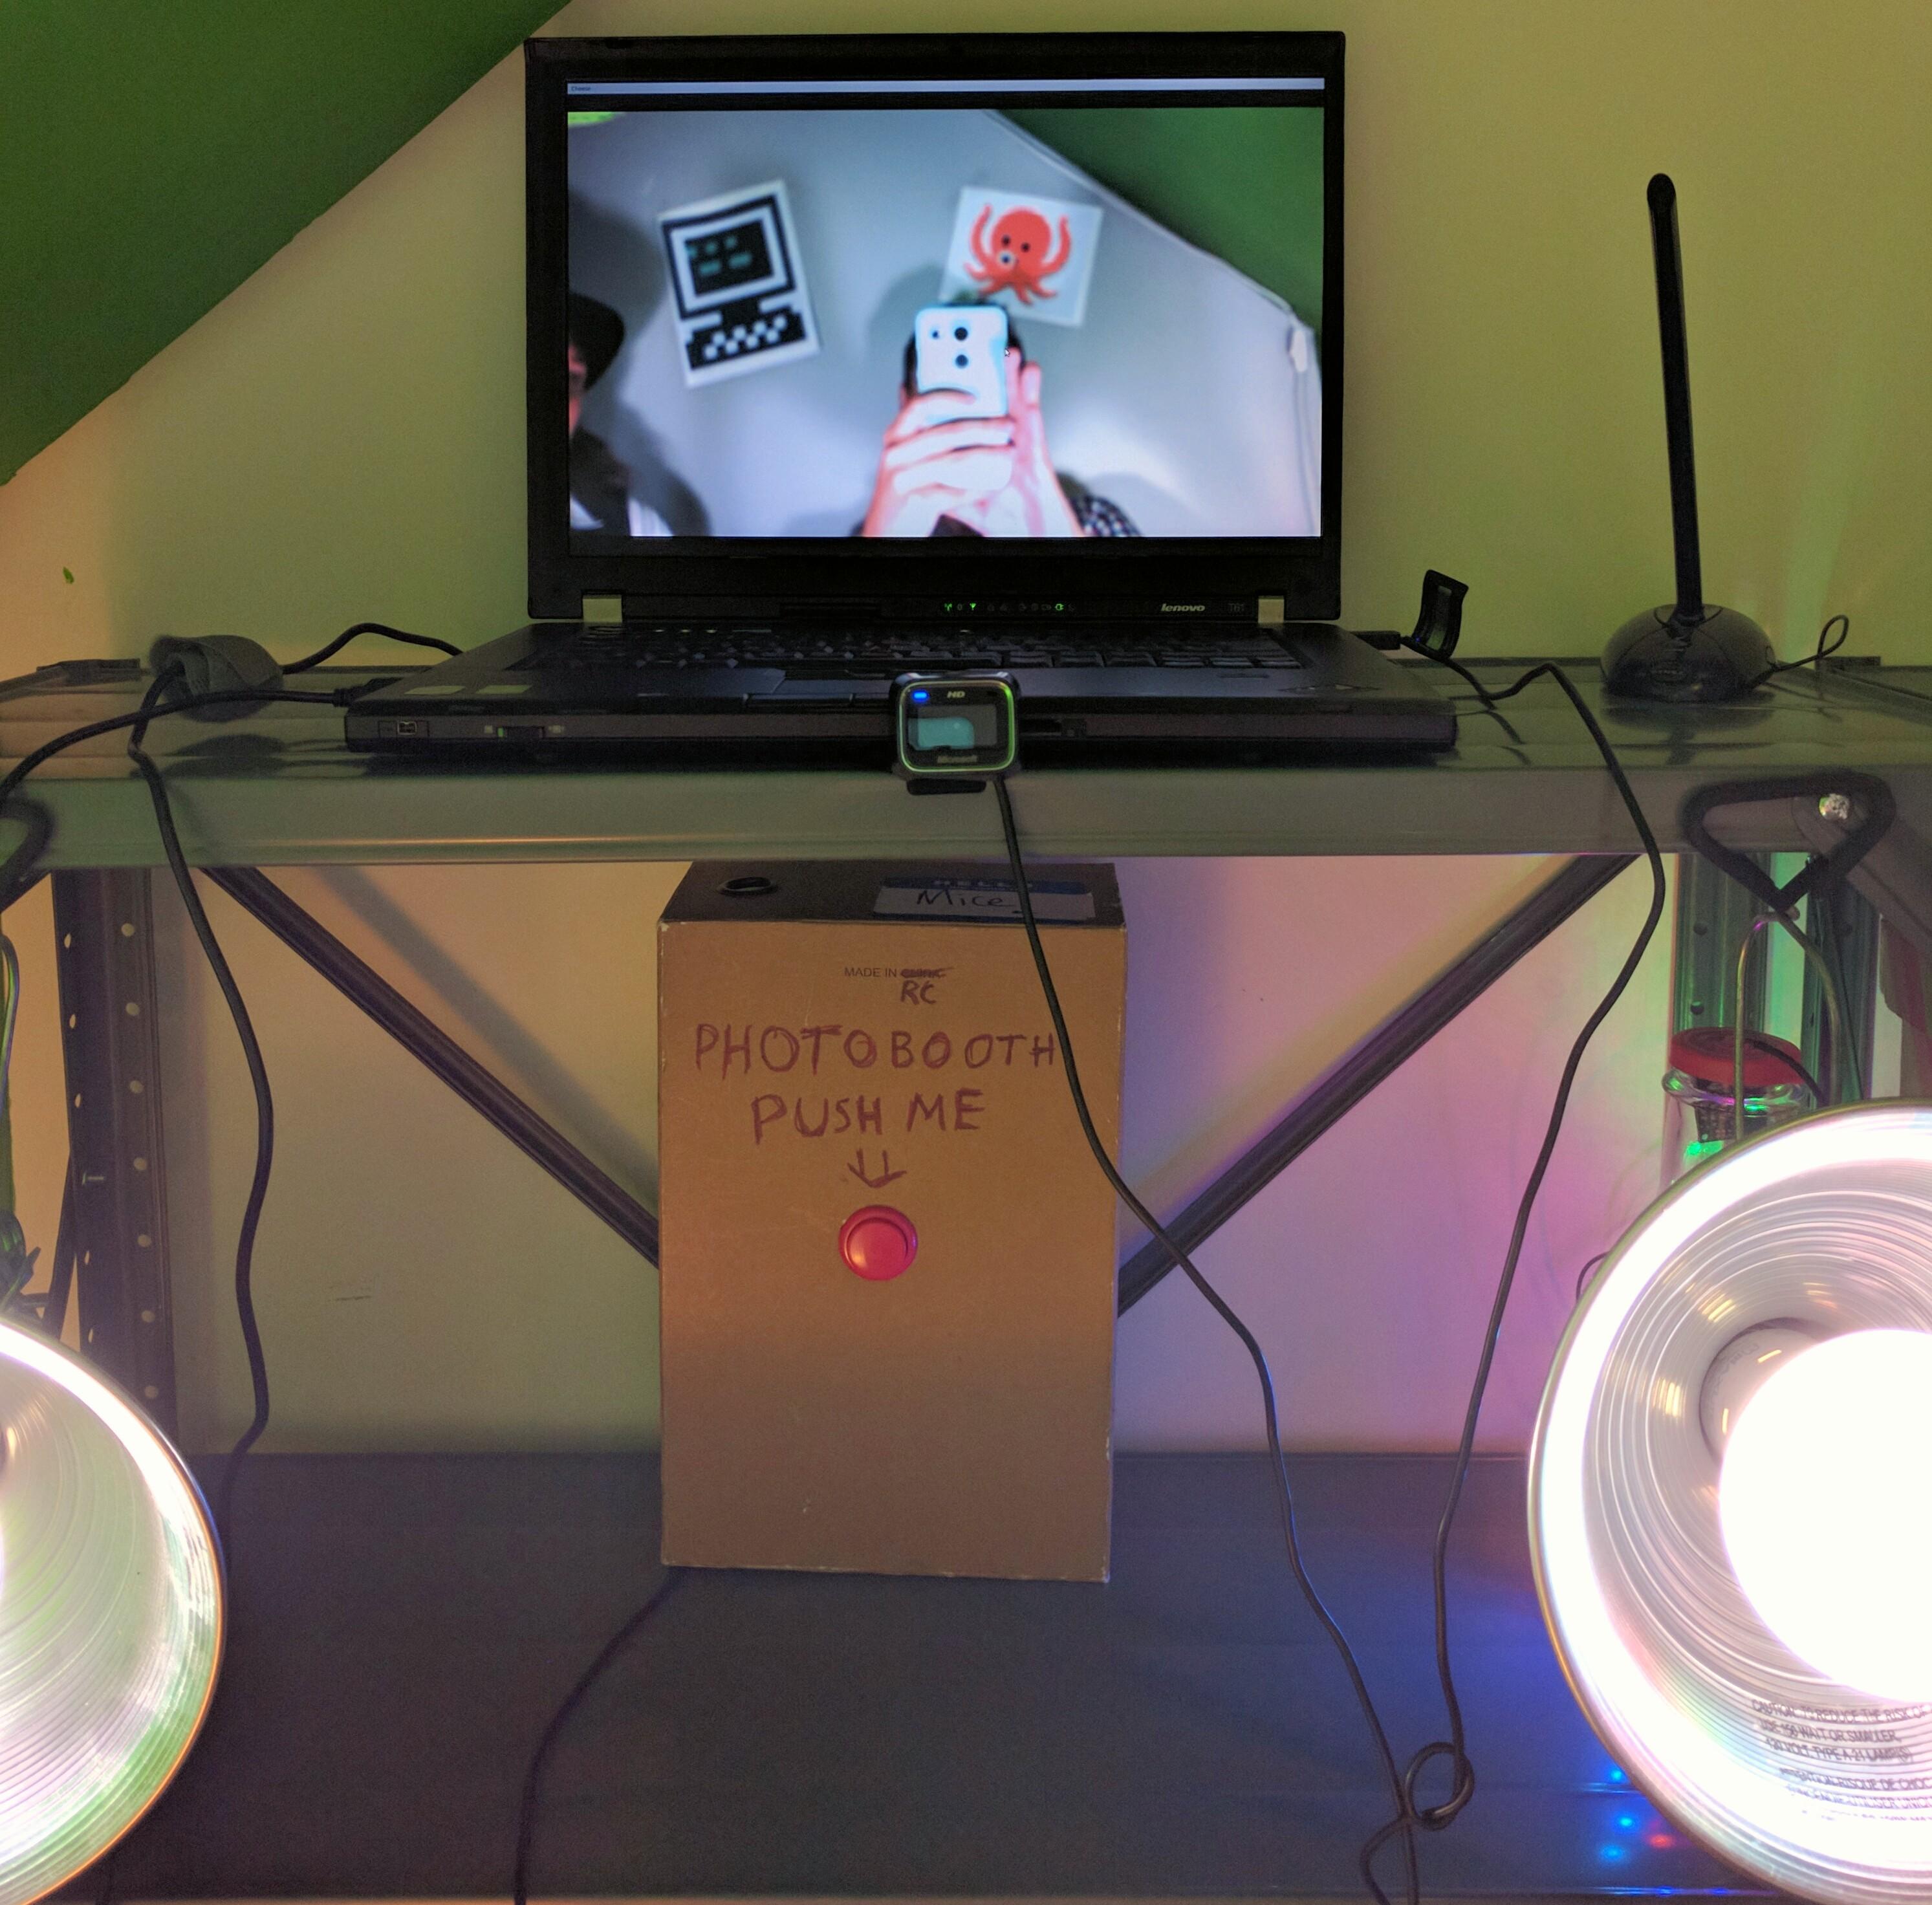 Photobooth setup